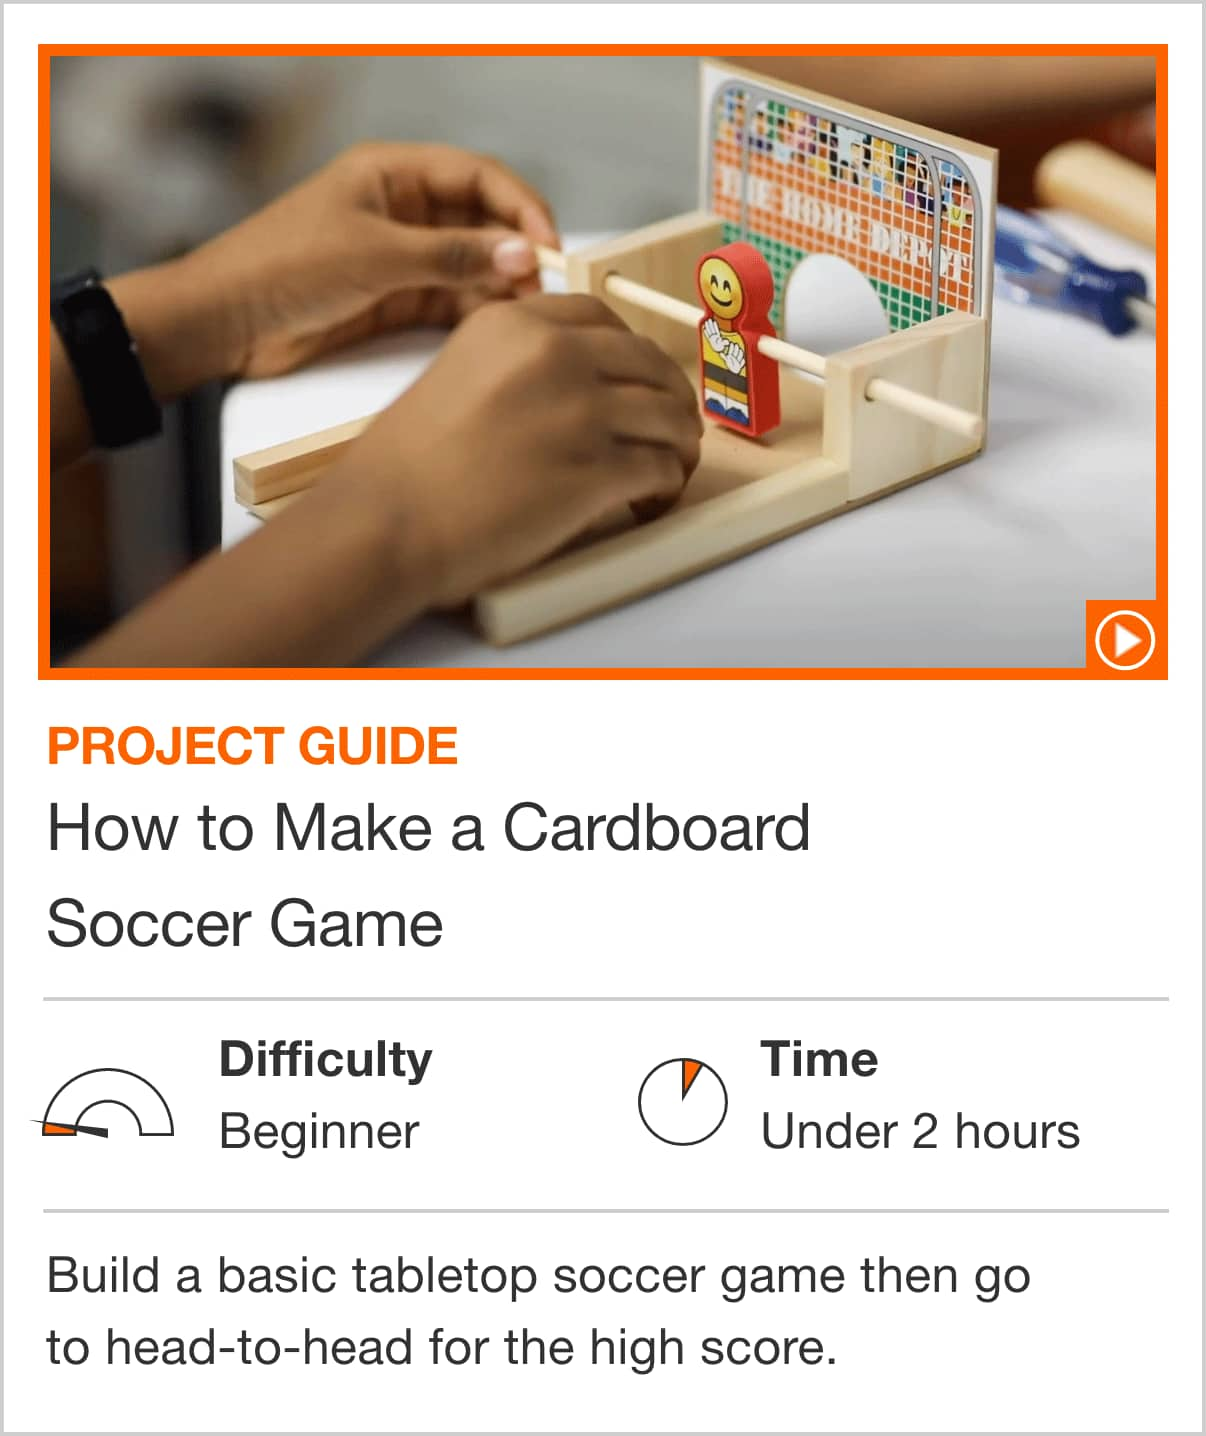 How to Make a Cardboard Soccer Game